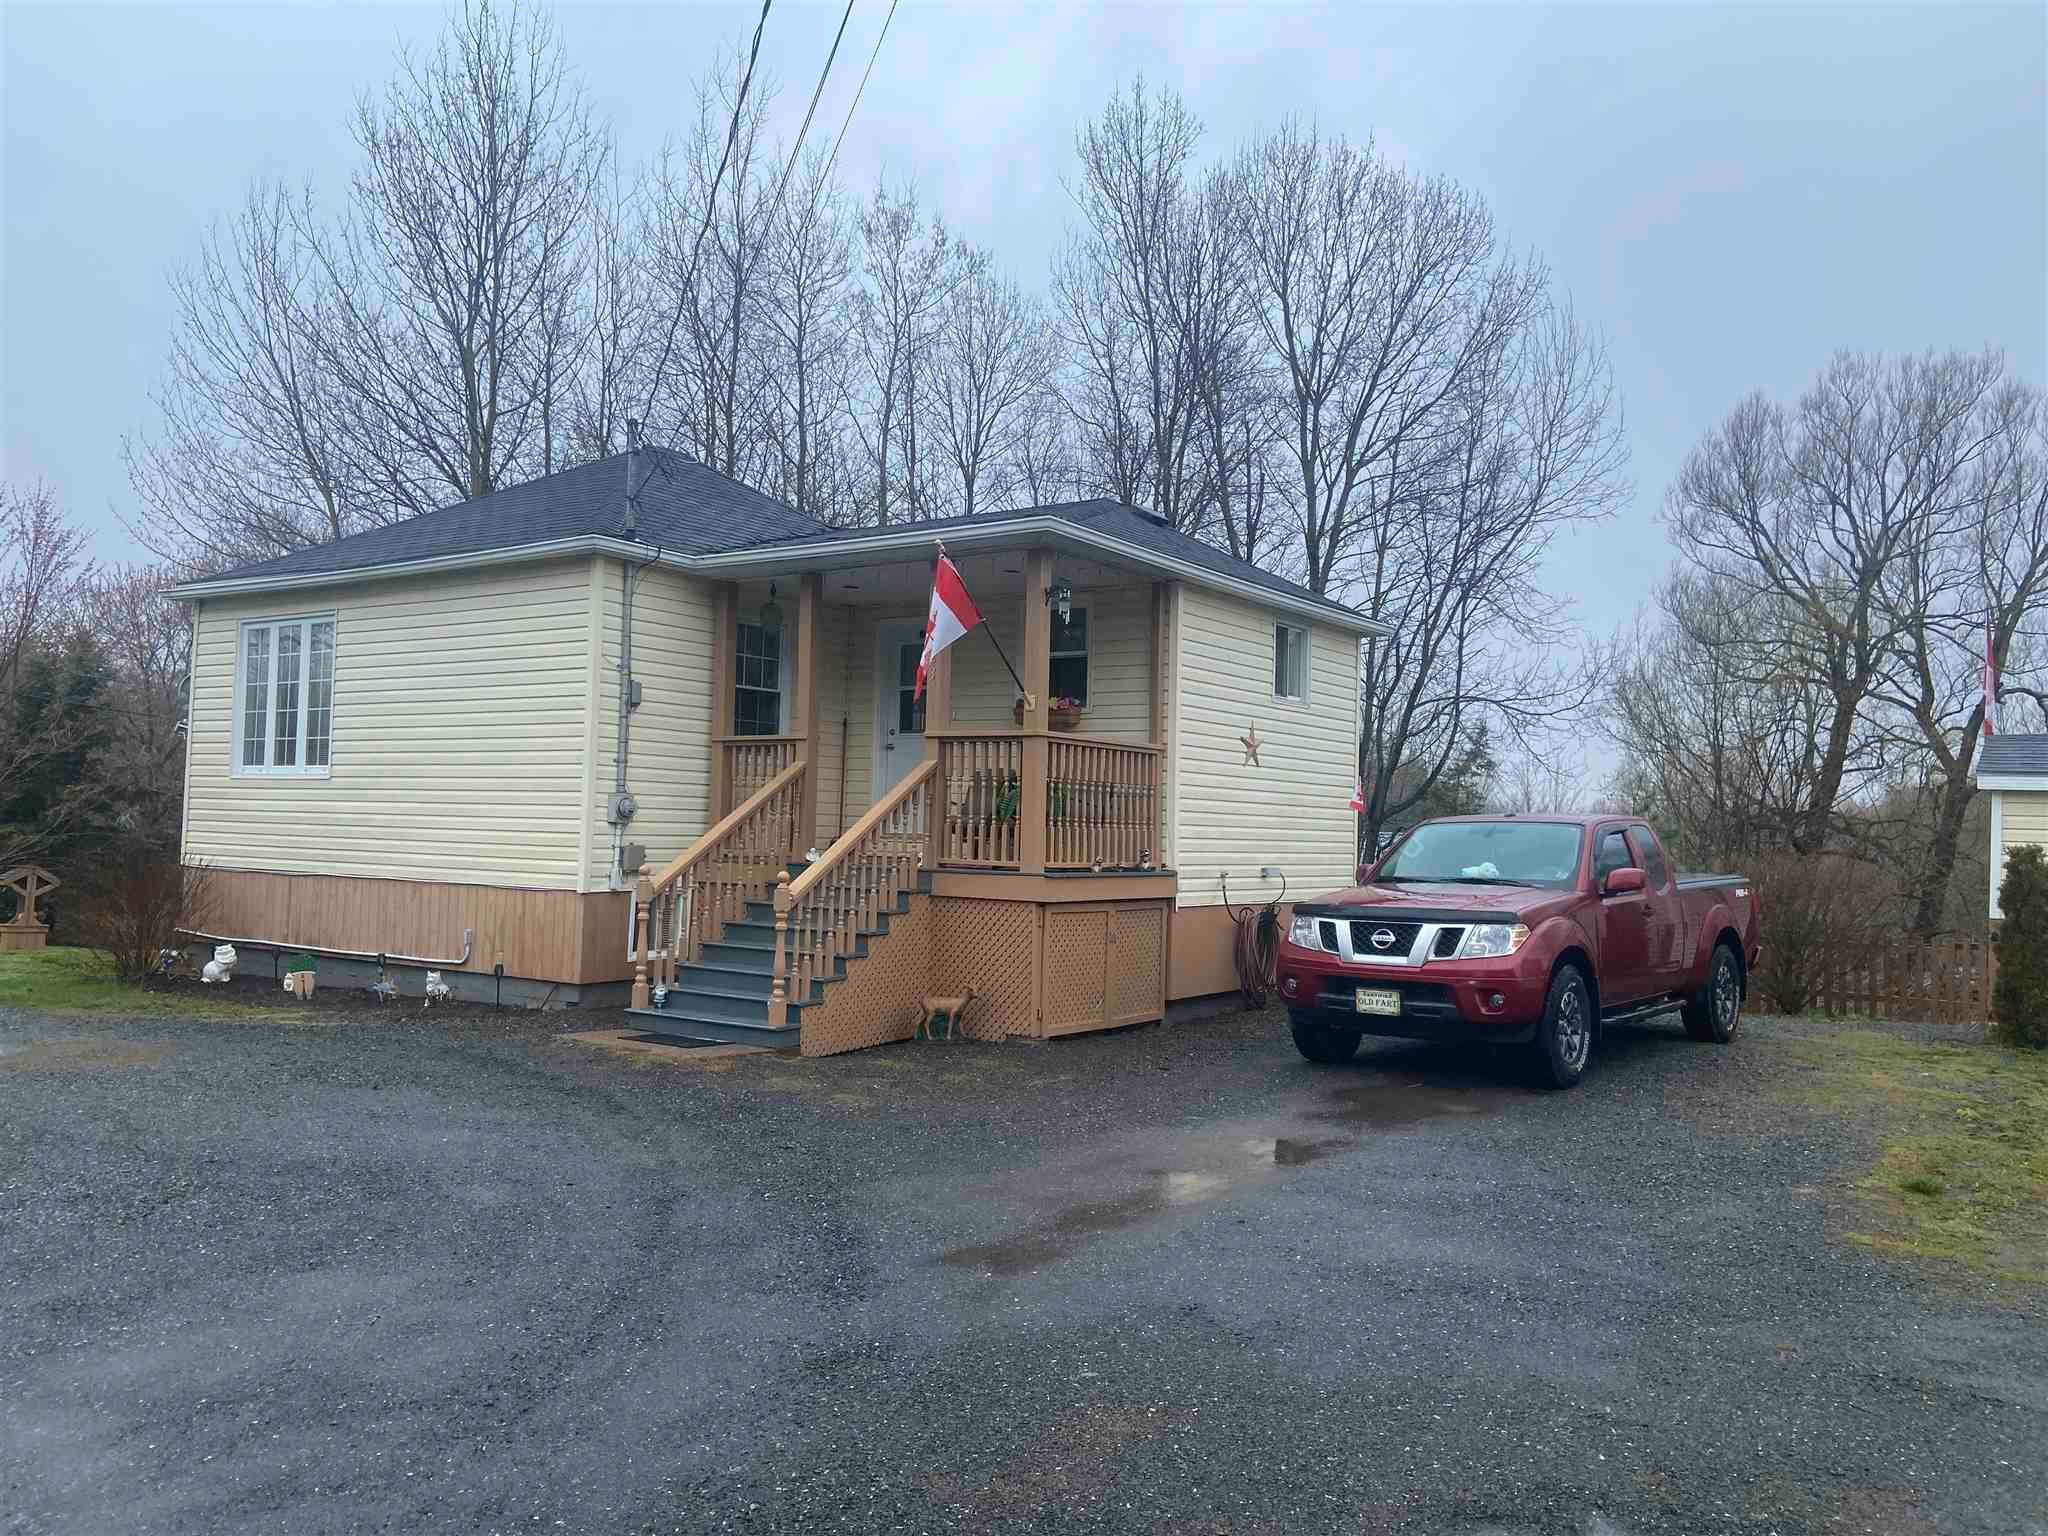 Main Photo: 2423 Westville Road in Westville: 107-Trenton,Westville,Pictou Residential for sale (Northern Region)  : MLS®# 202111180